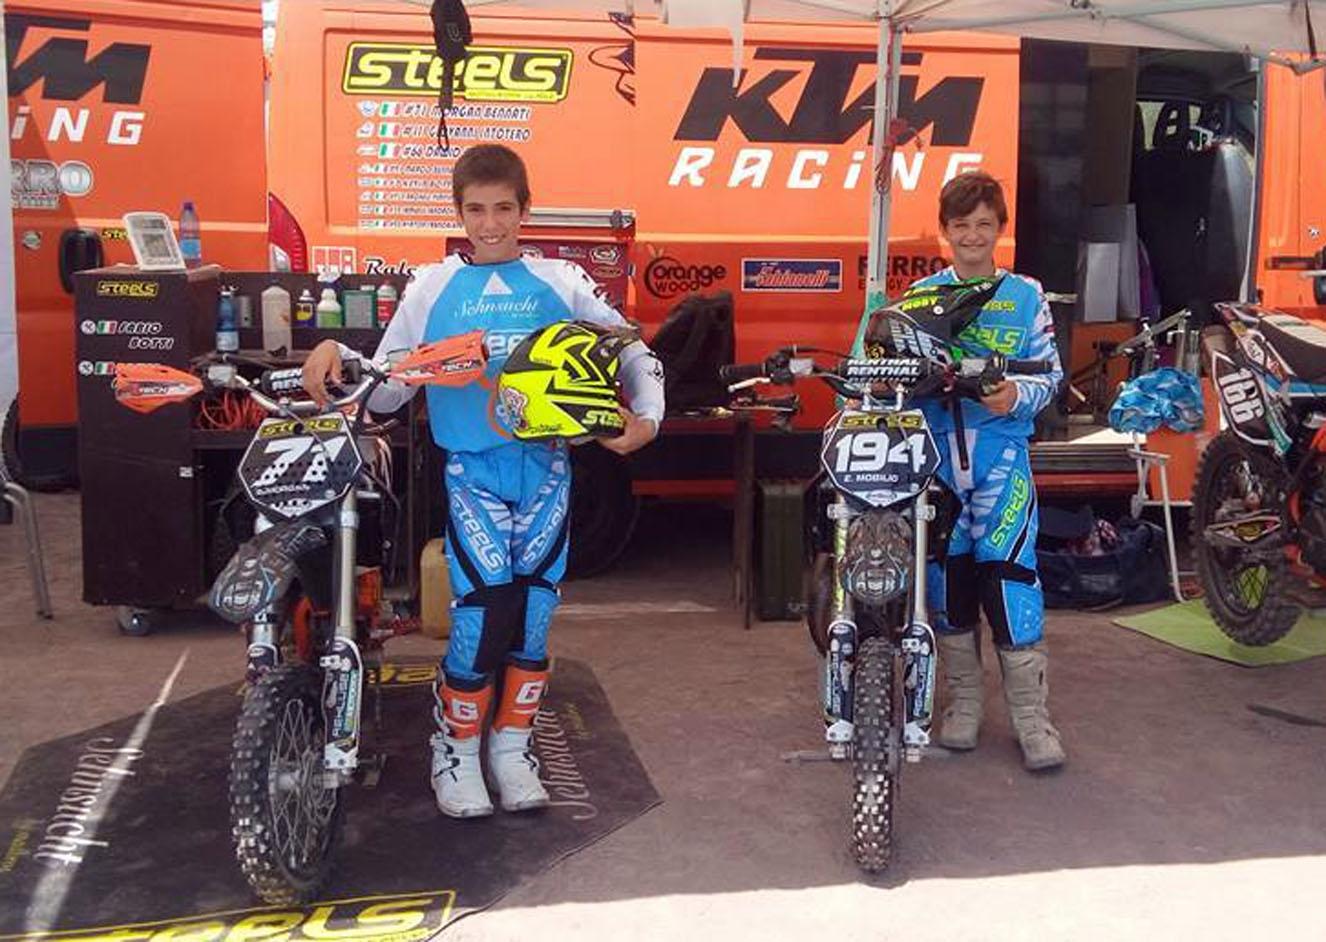 Due piloti di Steels ai campionati italiani di Motocross